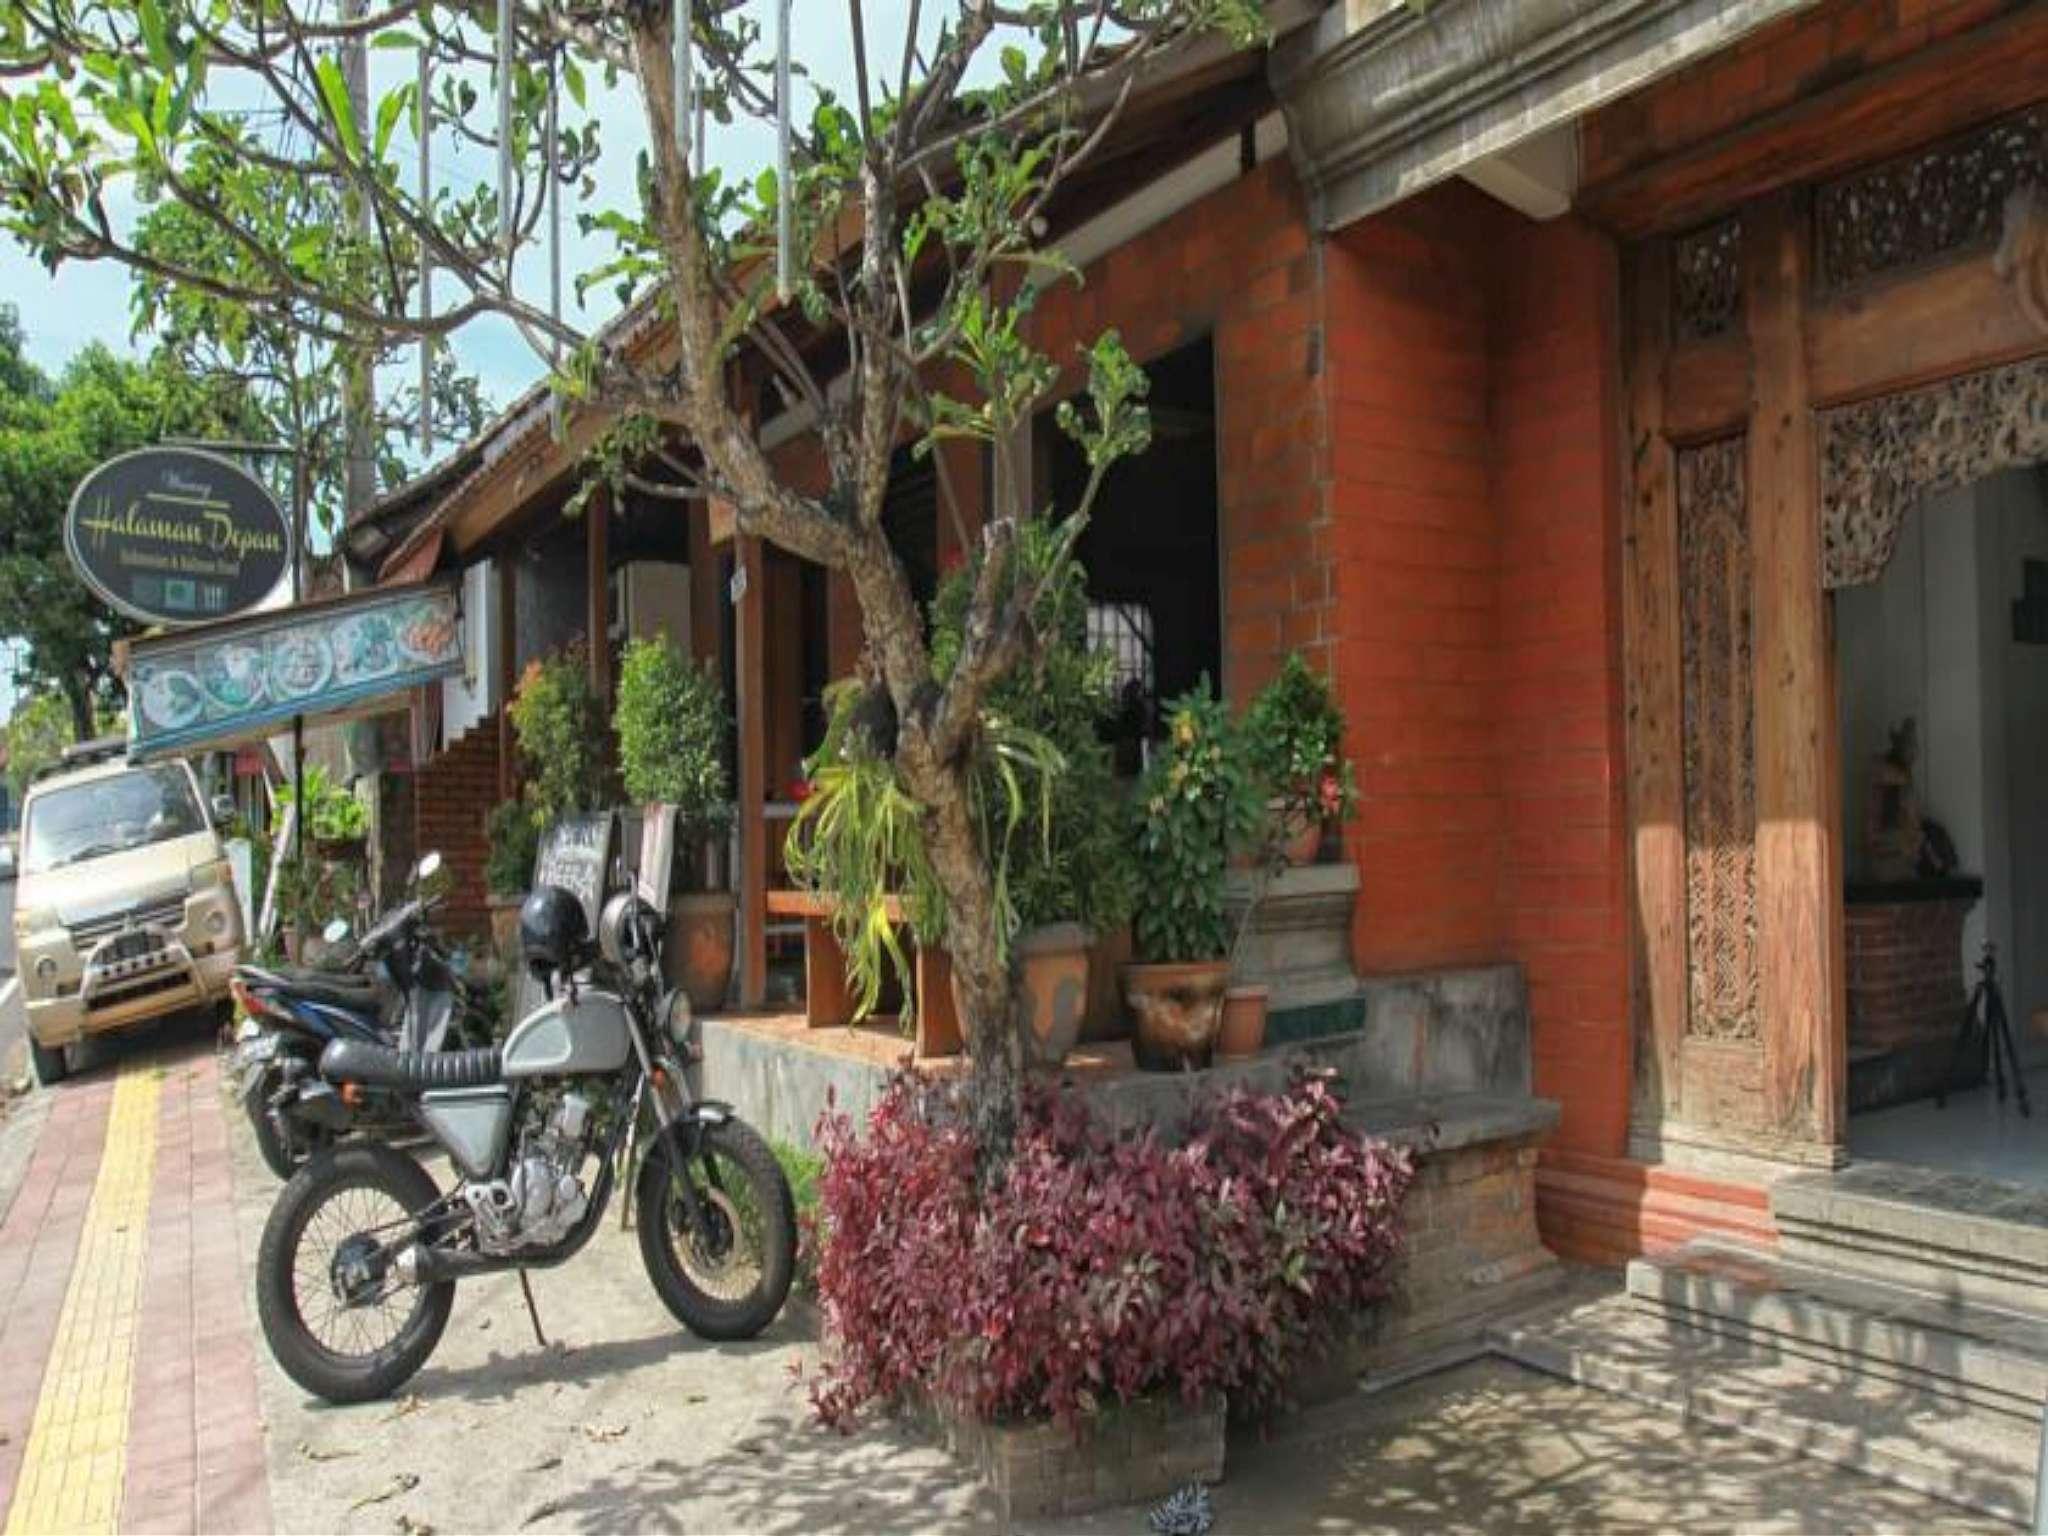 Halaman Depan Hostel, Gianyar